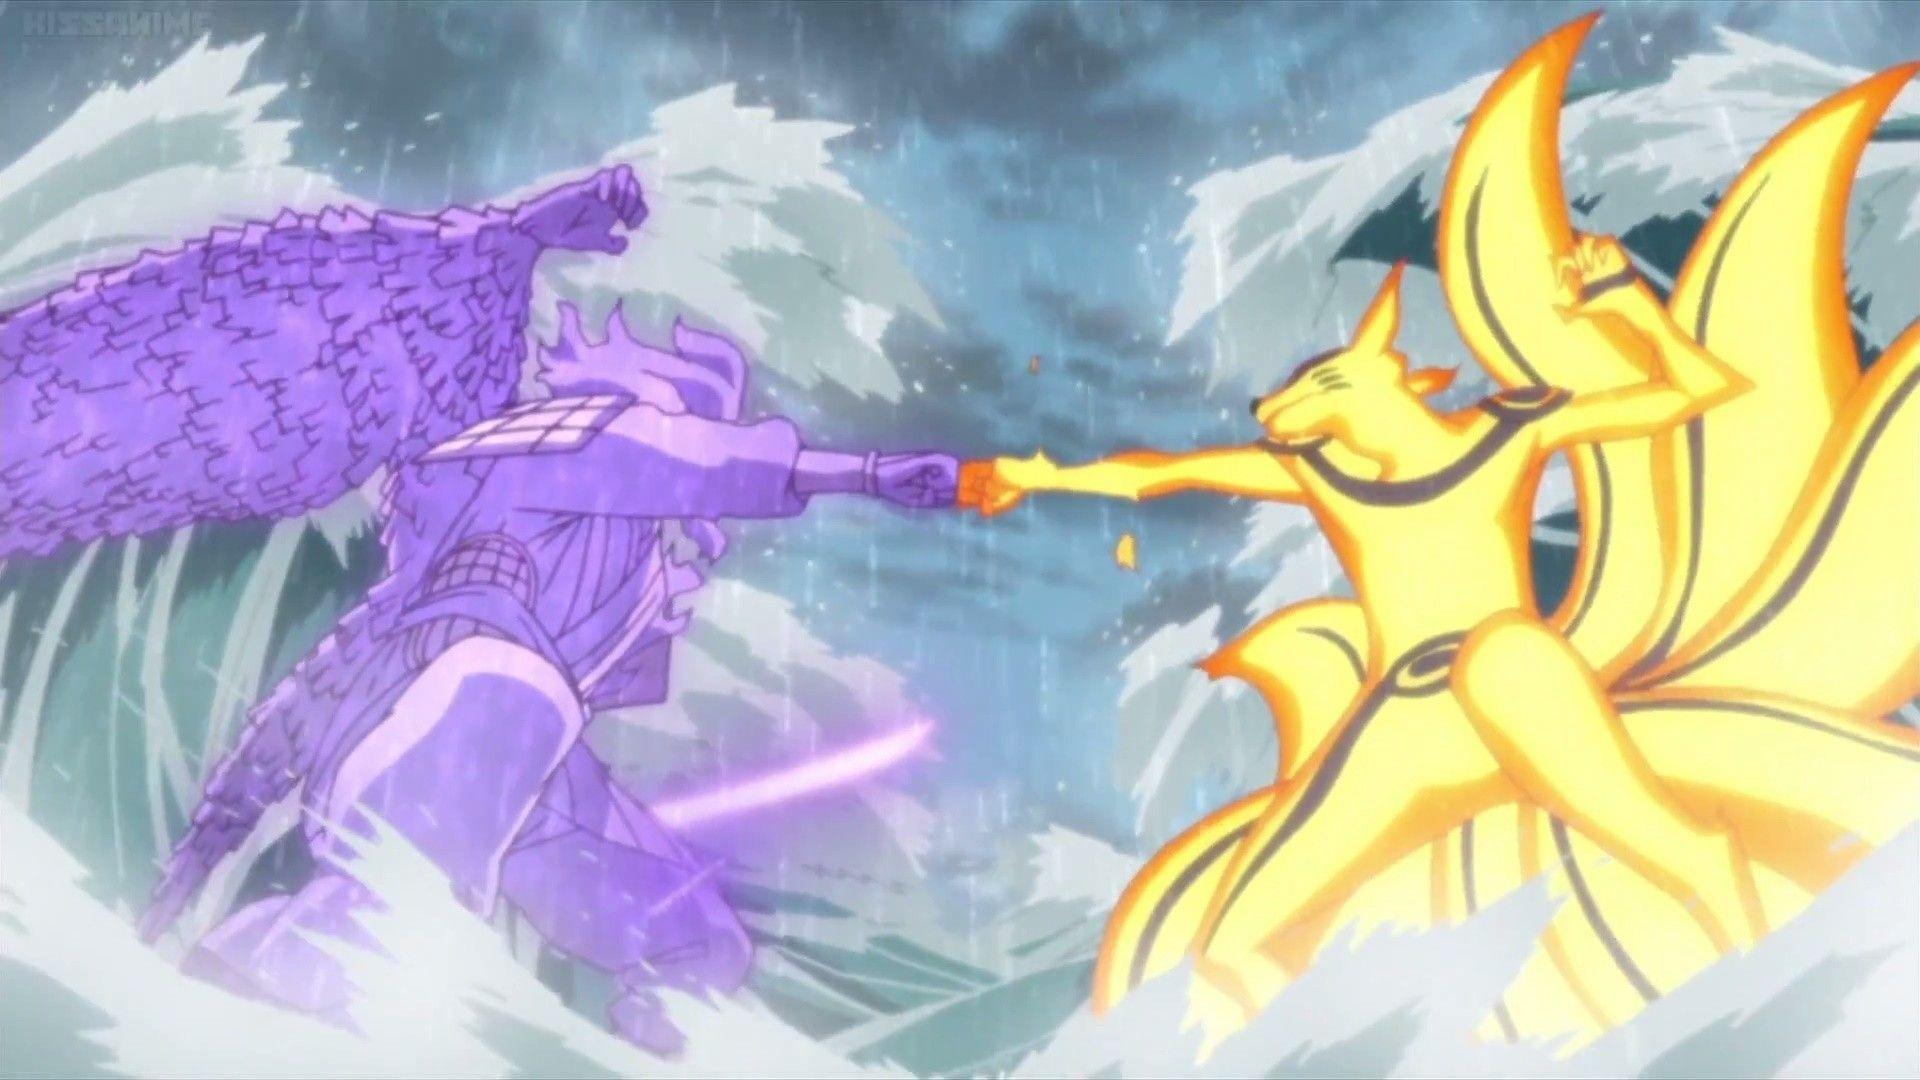 Free download Naruto Vs Sasuke Final Battle Wallpaper ...